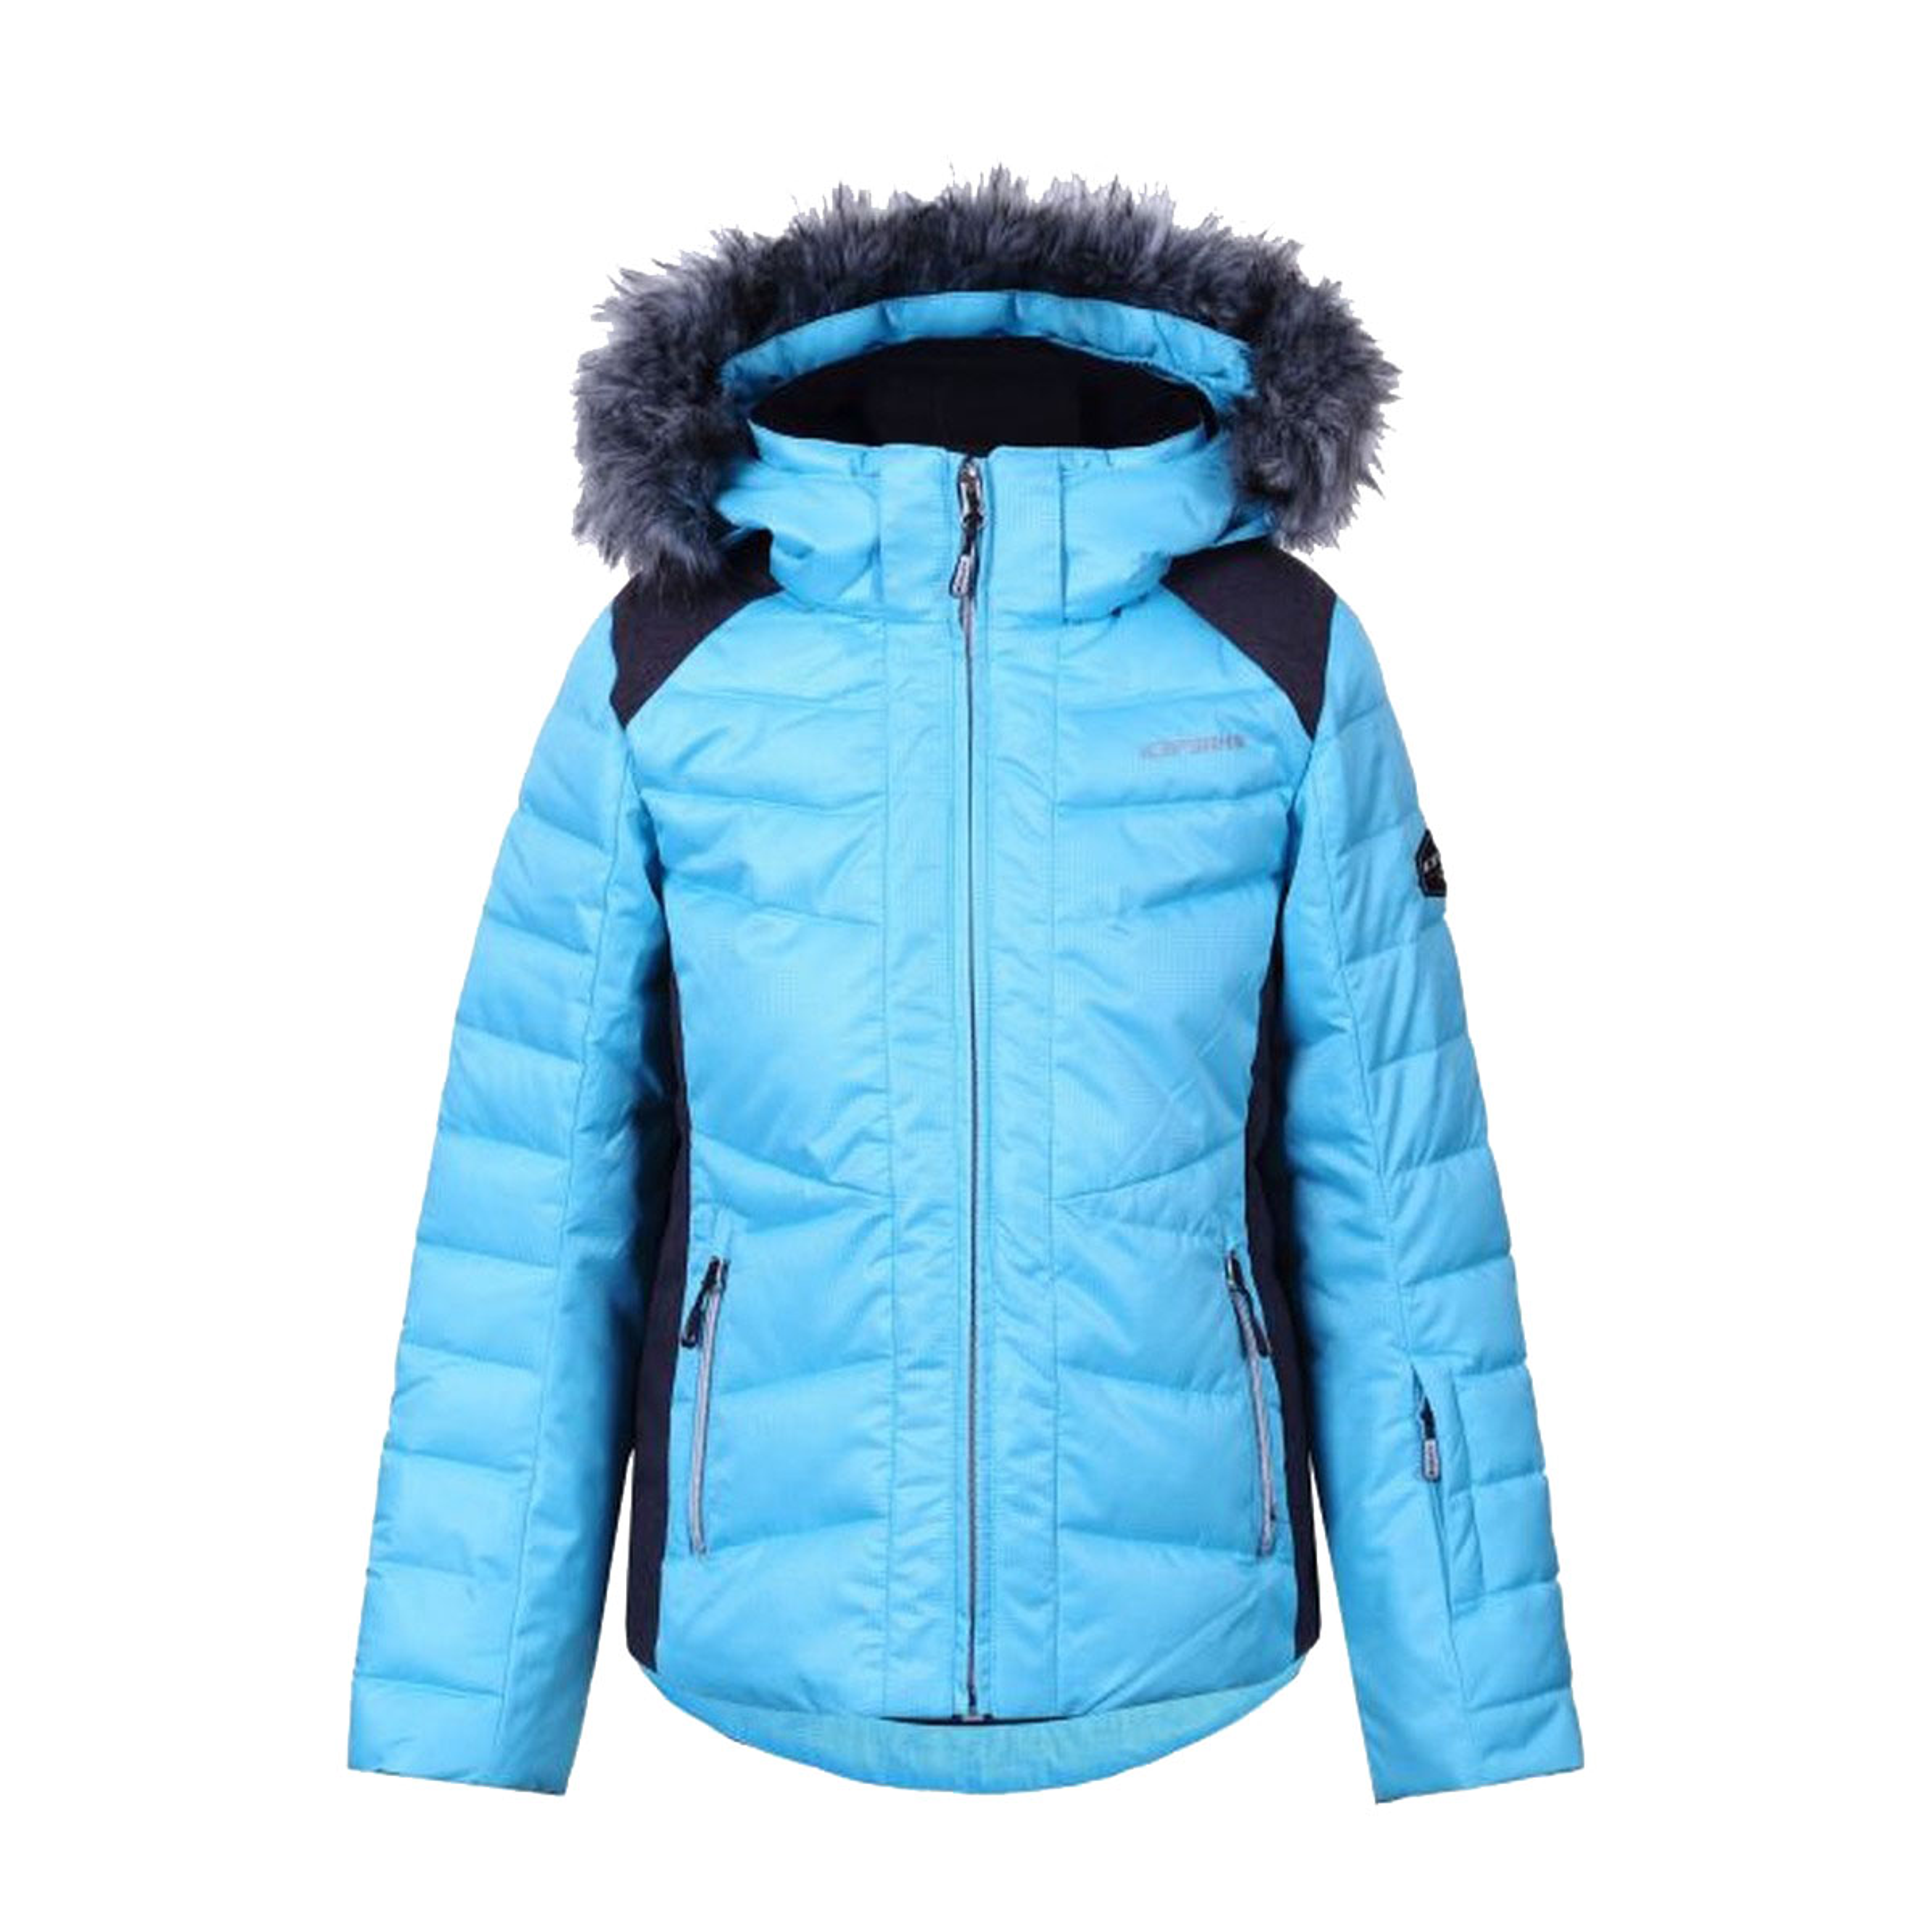 0dc6af93a51 Icepeak Hara Ski Jas Junior - Ski jassen - Kleding - Wintersport ...